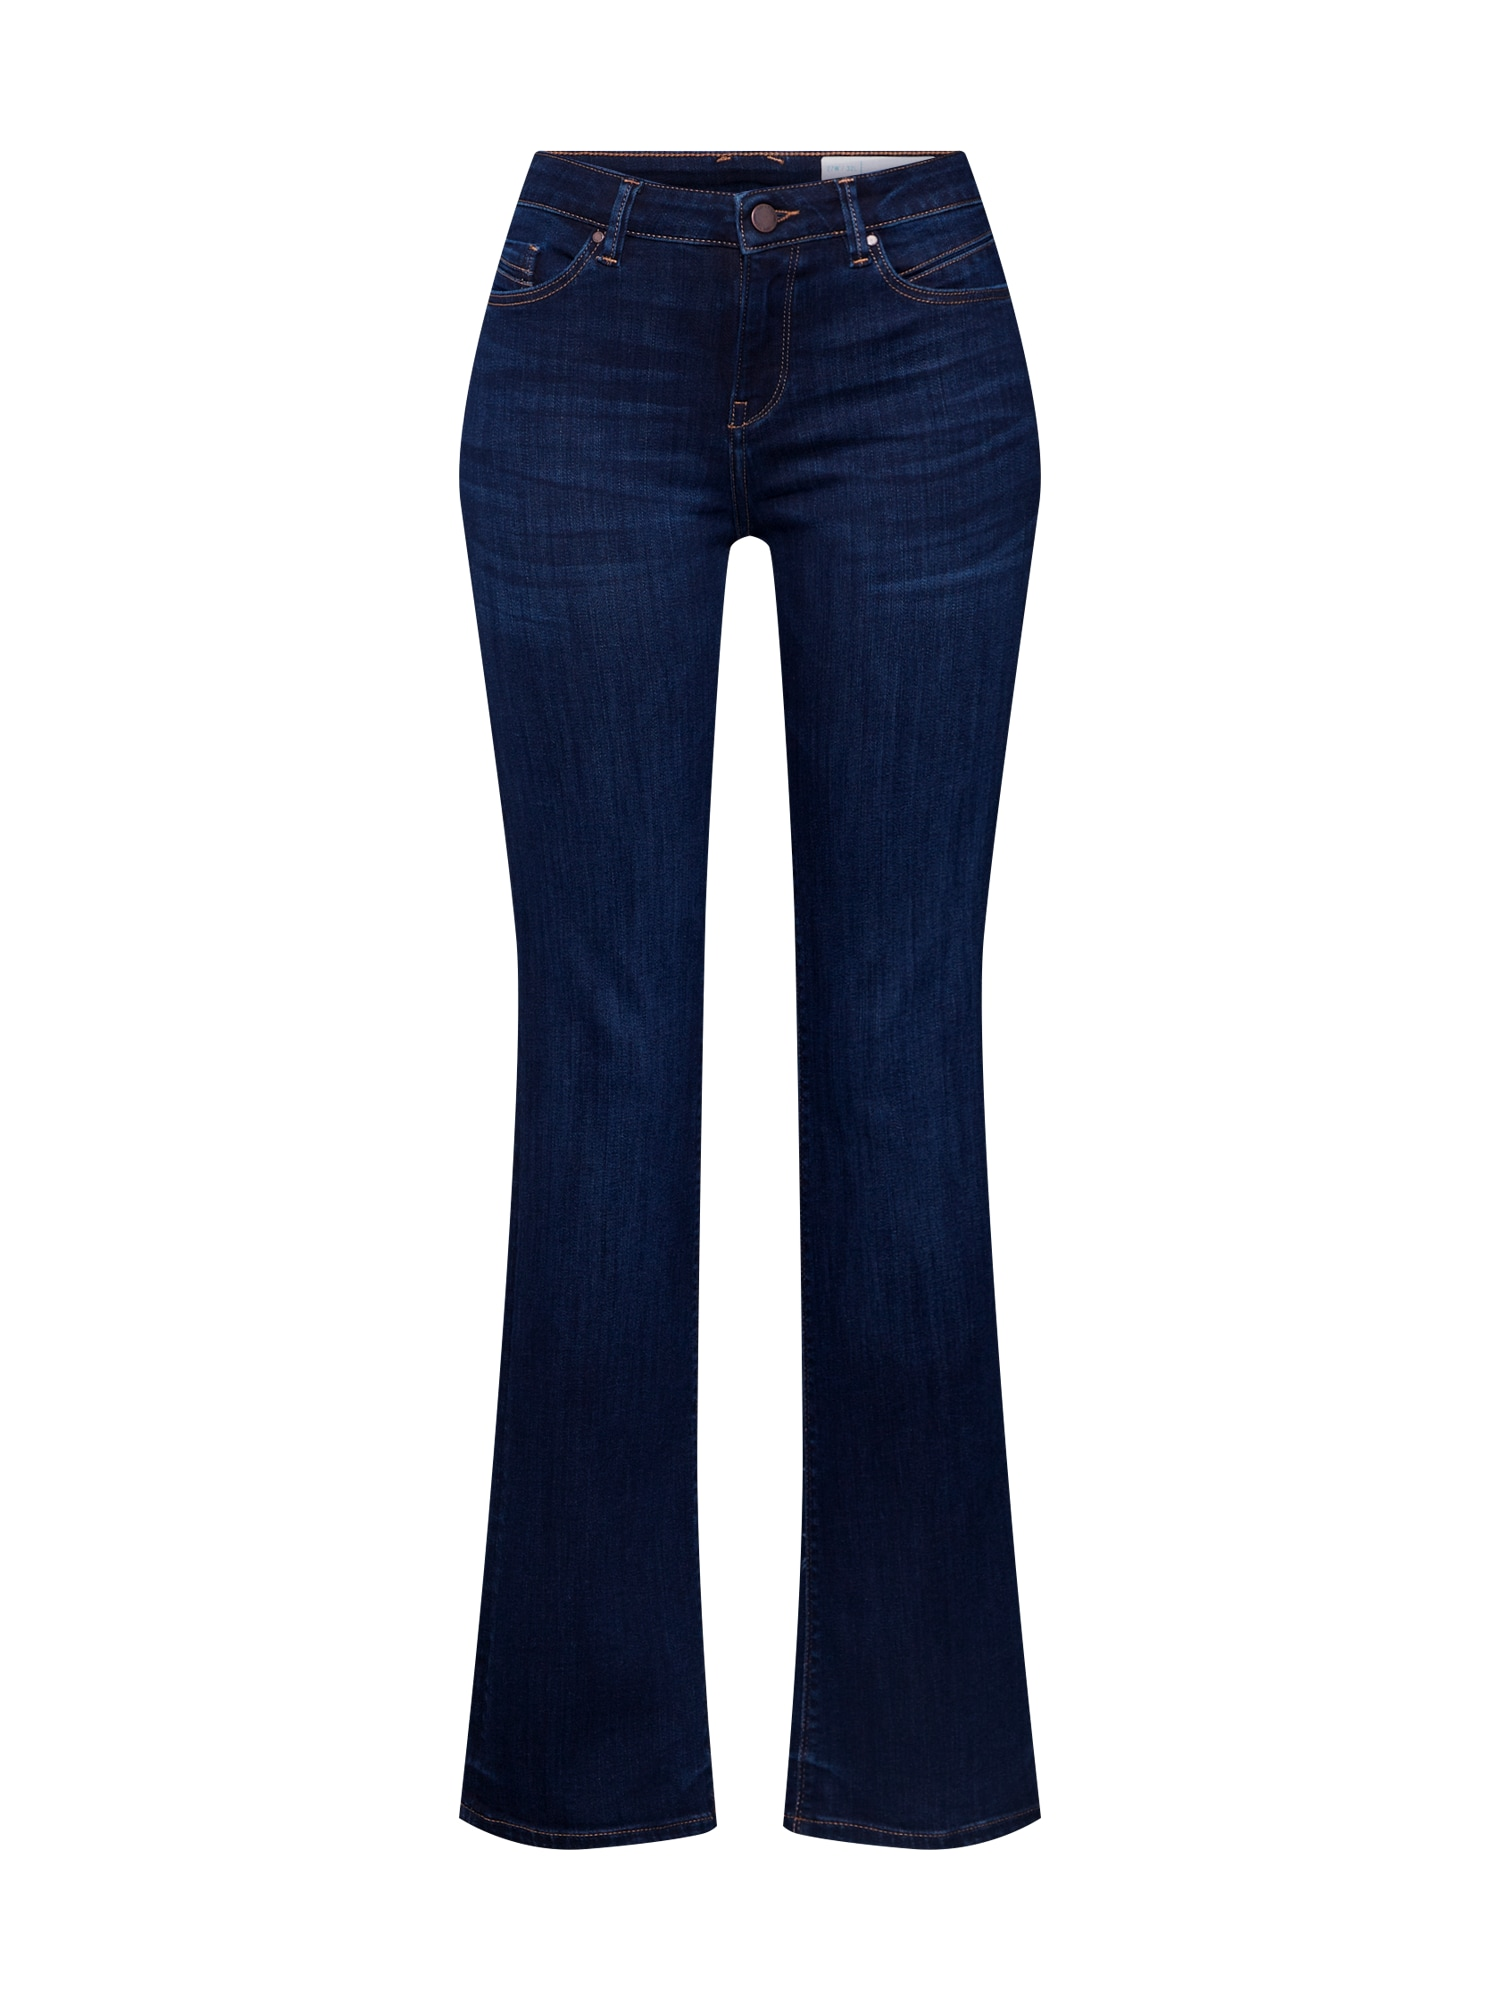 ESPRIT Džinsai 'OCS MR Bootcut' tamsiai (džinso) mėlyna / tamsiai mėlyna